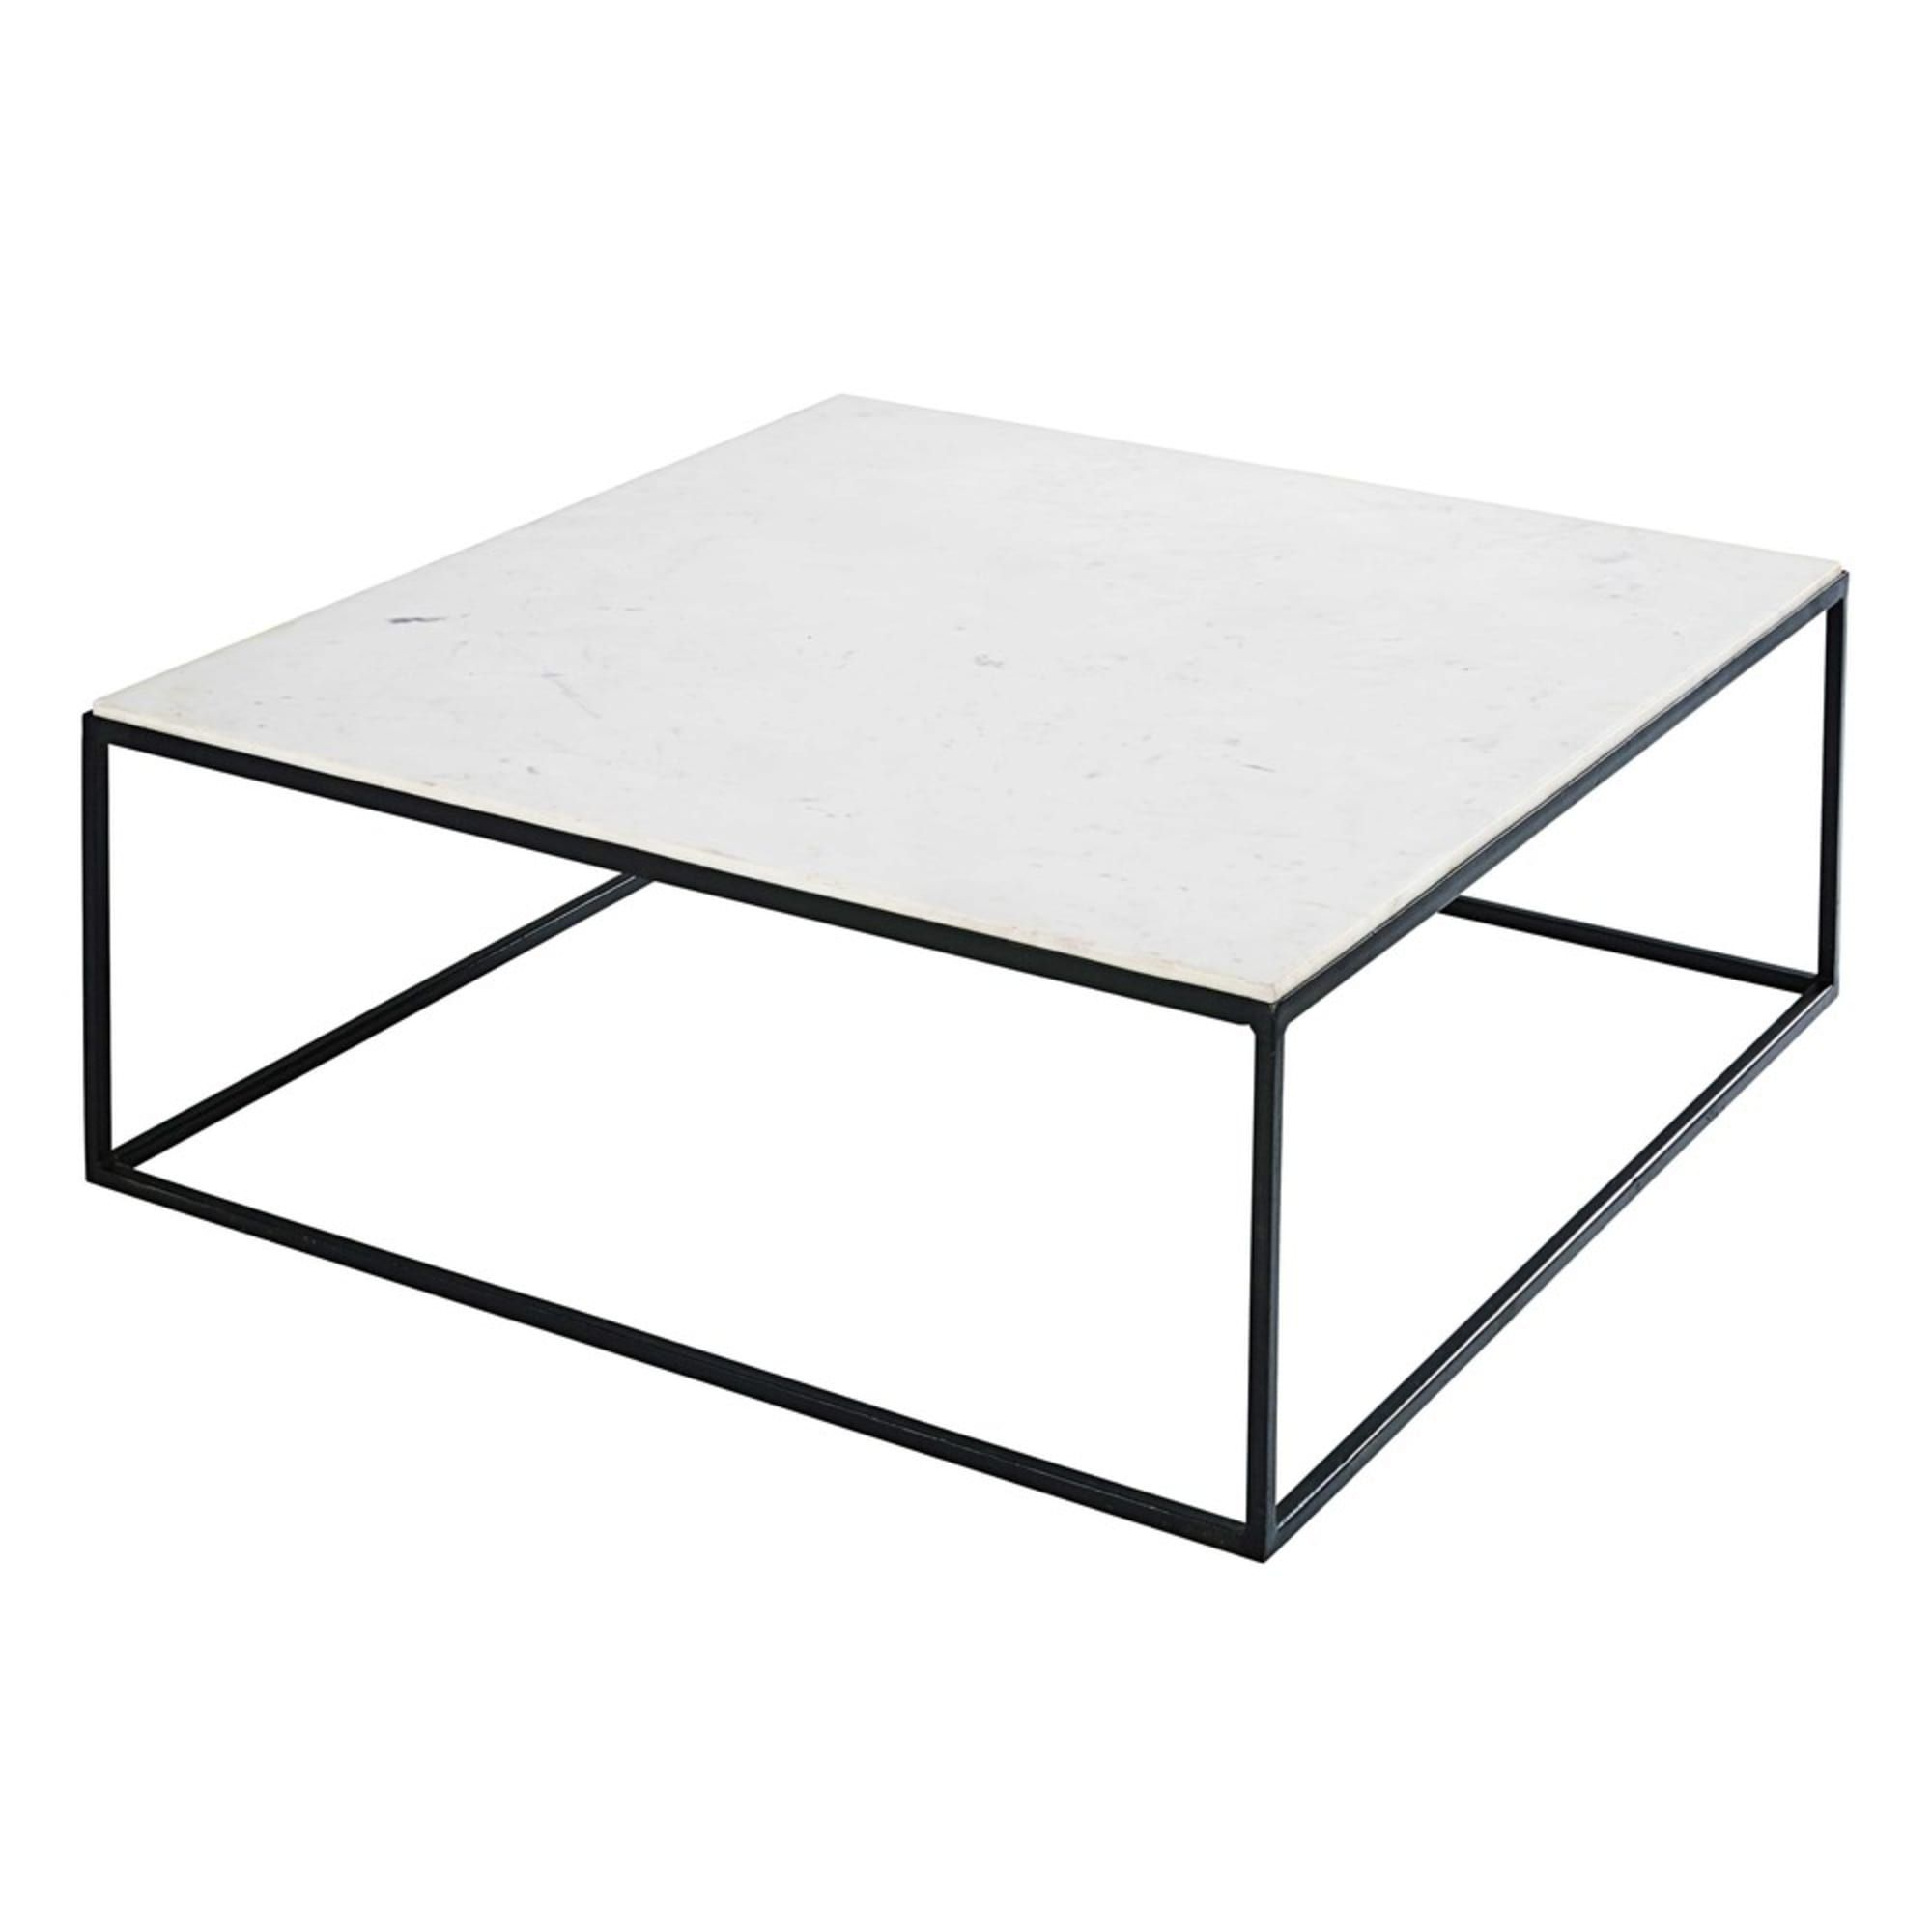 Table Basse Carree En Marbre Blanc Et Metal Noir Maisons Du Monde Table Basse Carree Table Basse Table Basse Marbre